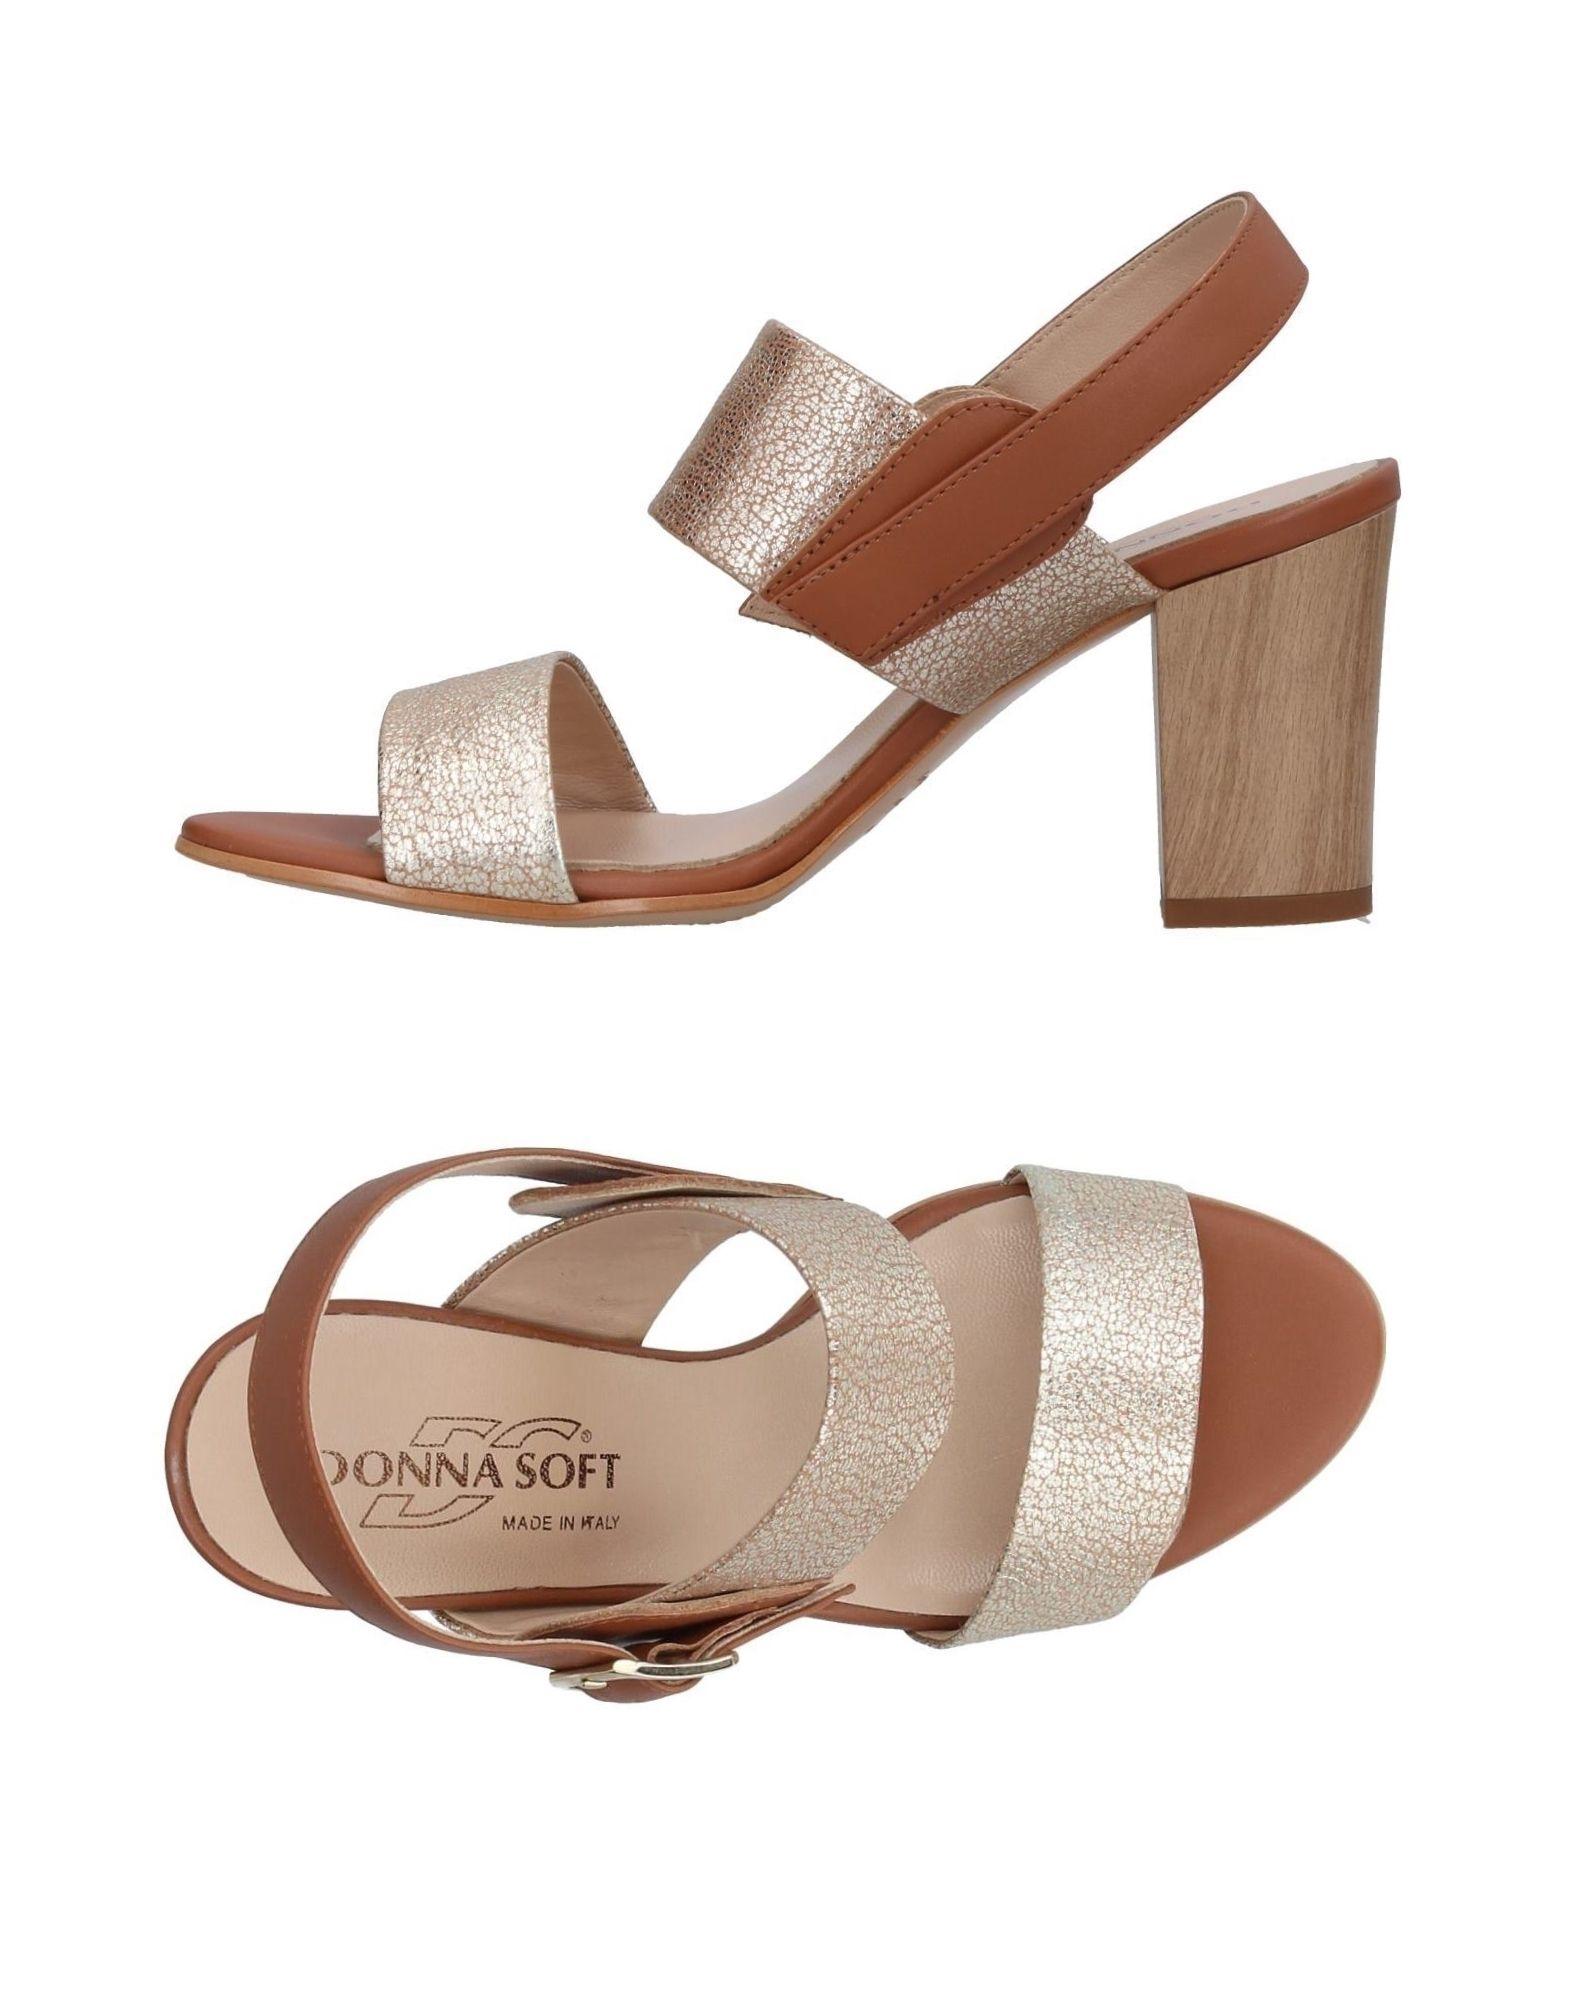 Donna Soft Sandalen Damen  11392201HK Gute Qualität beliebte Schuhe